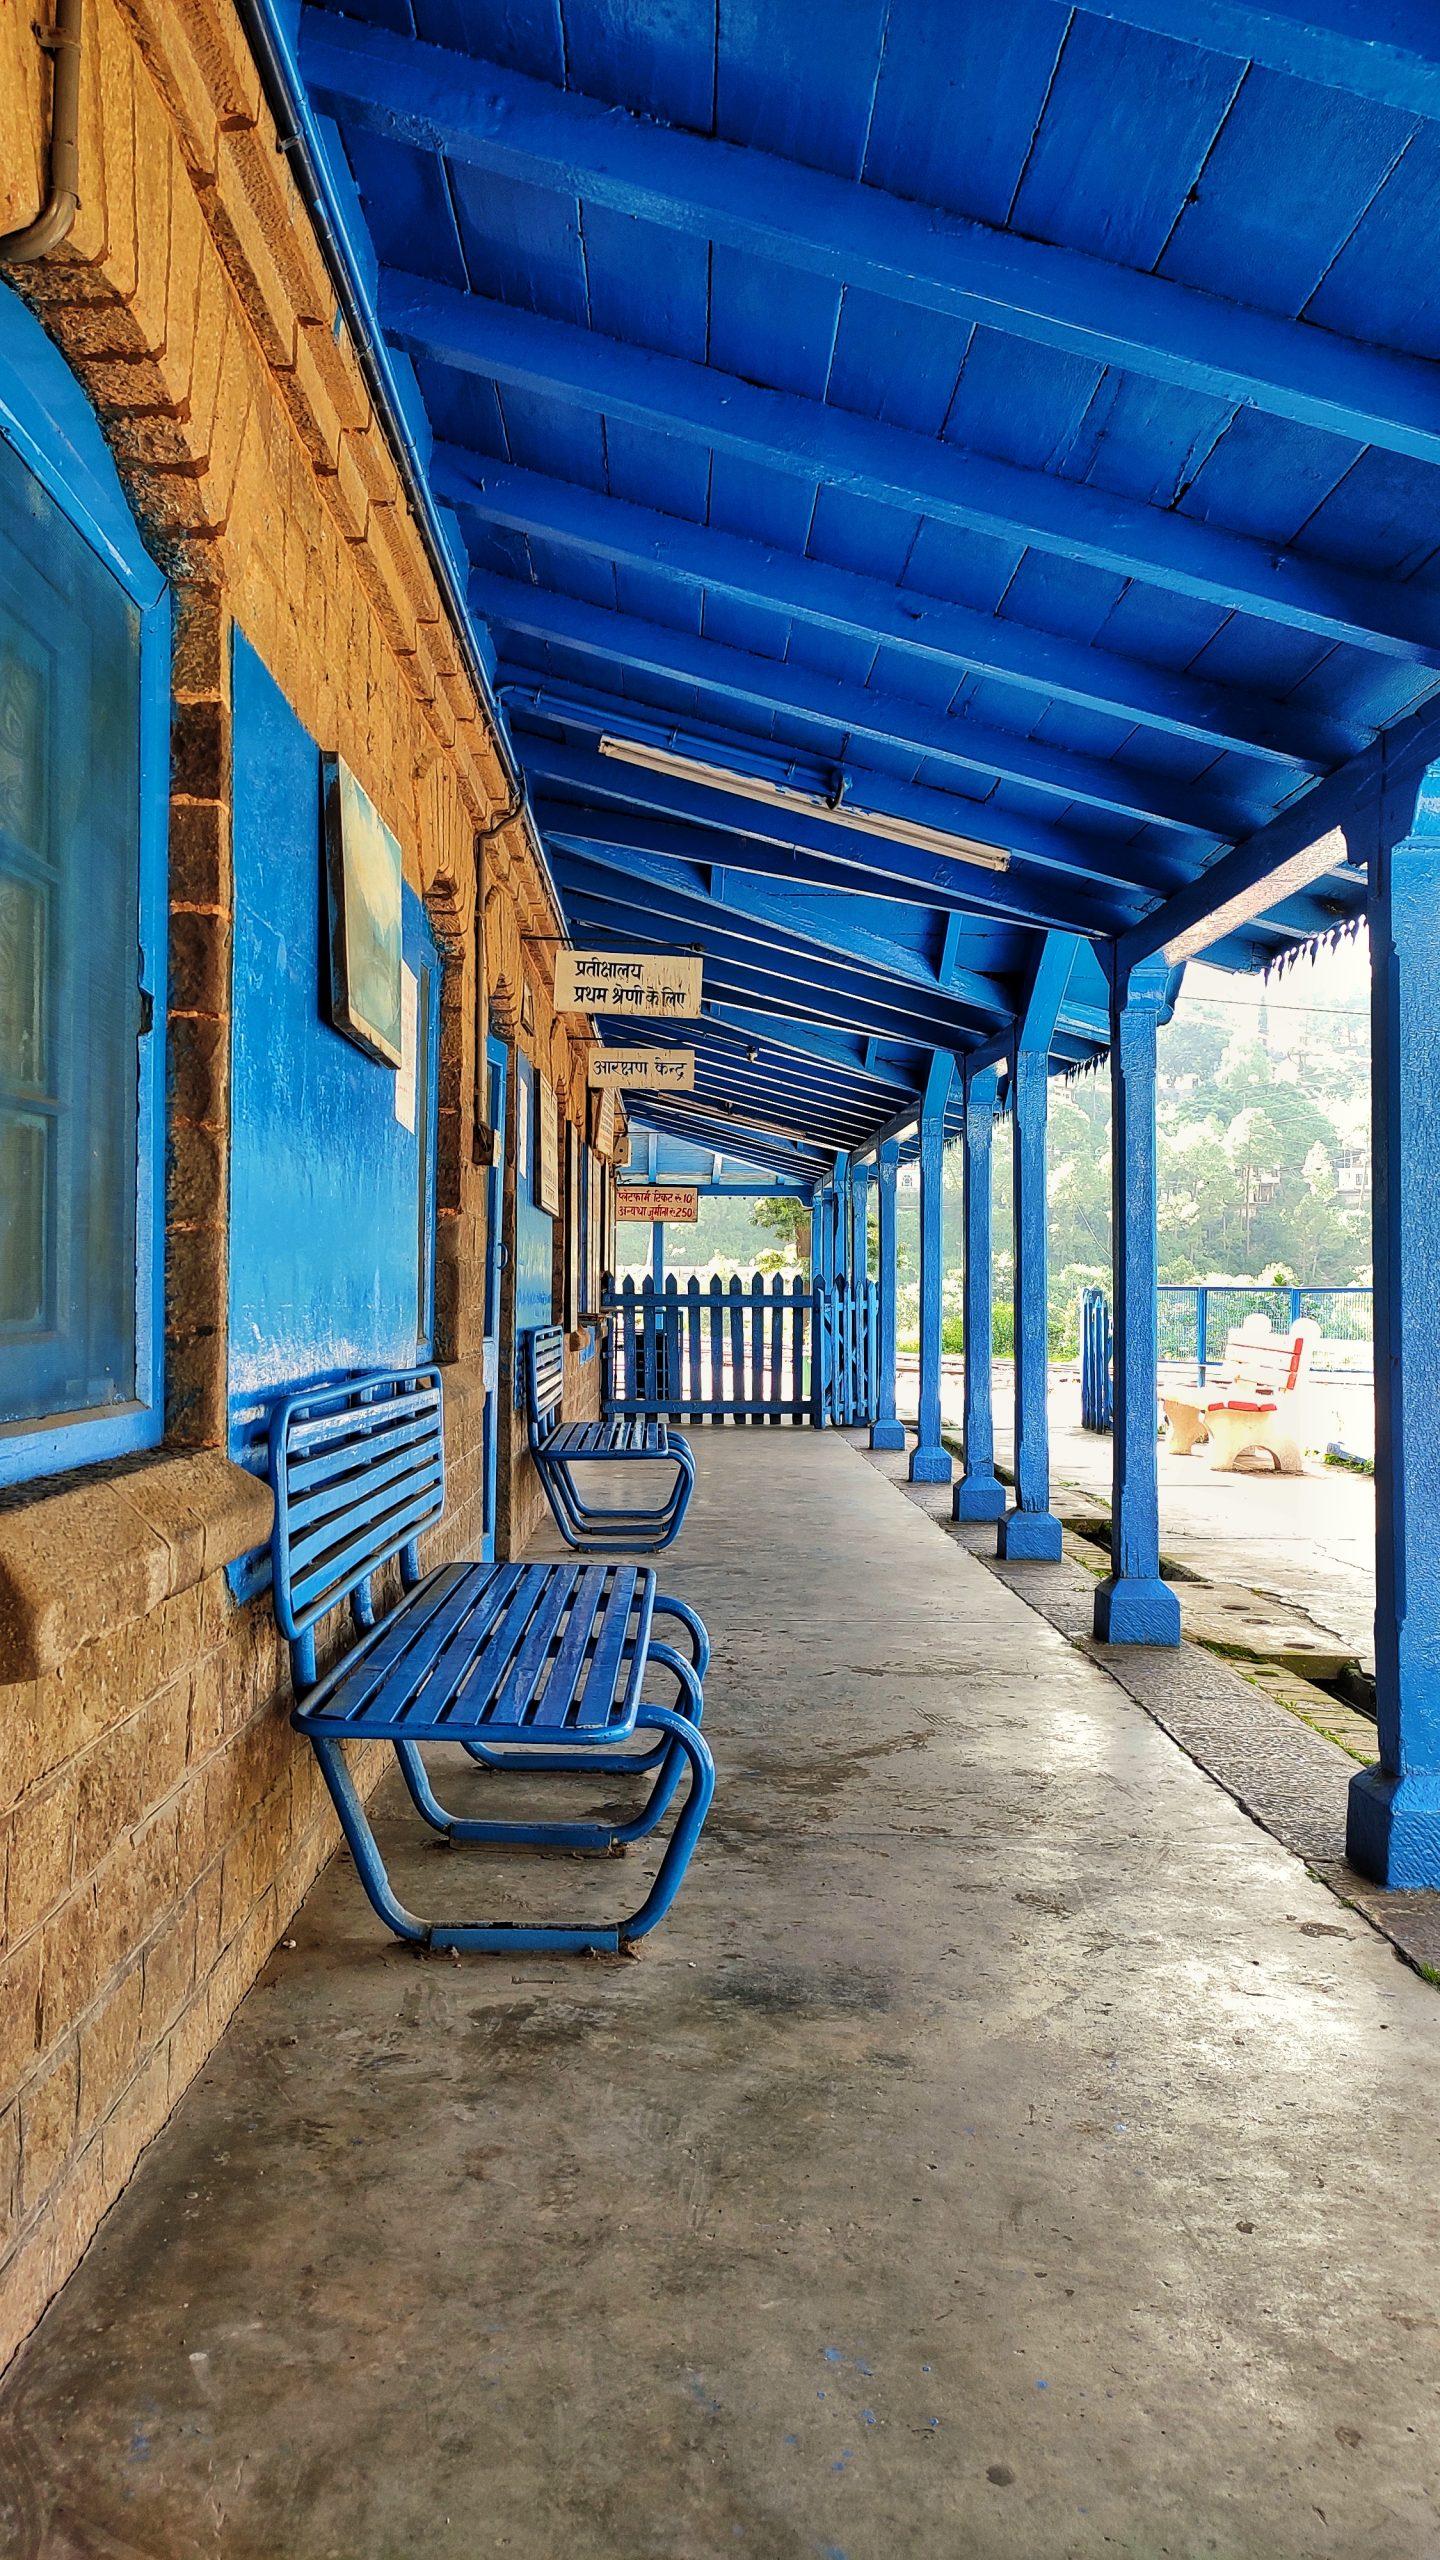 Indian railway station portrait